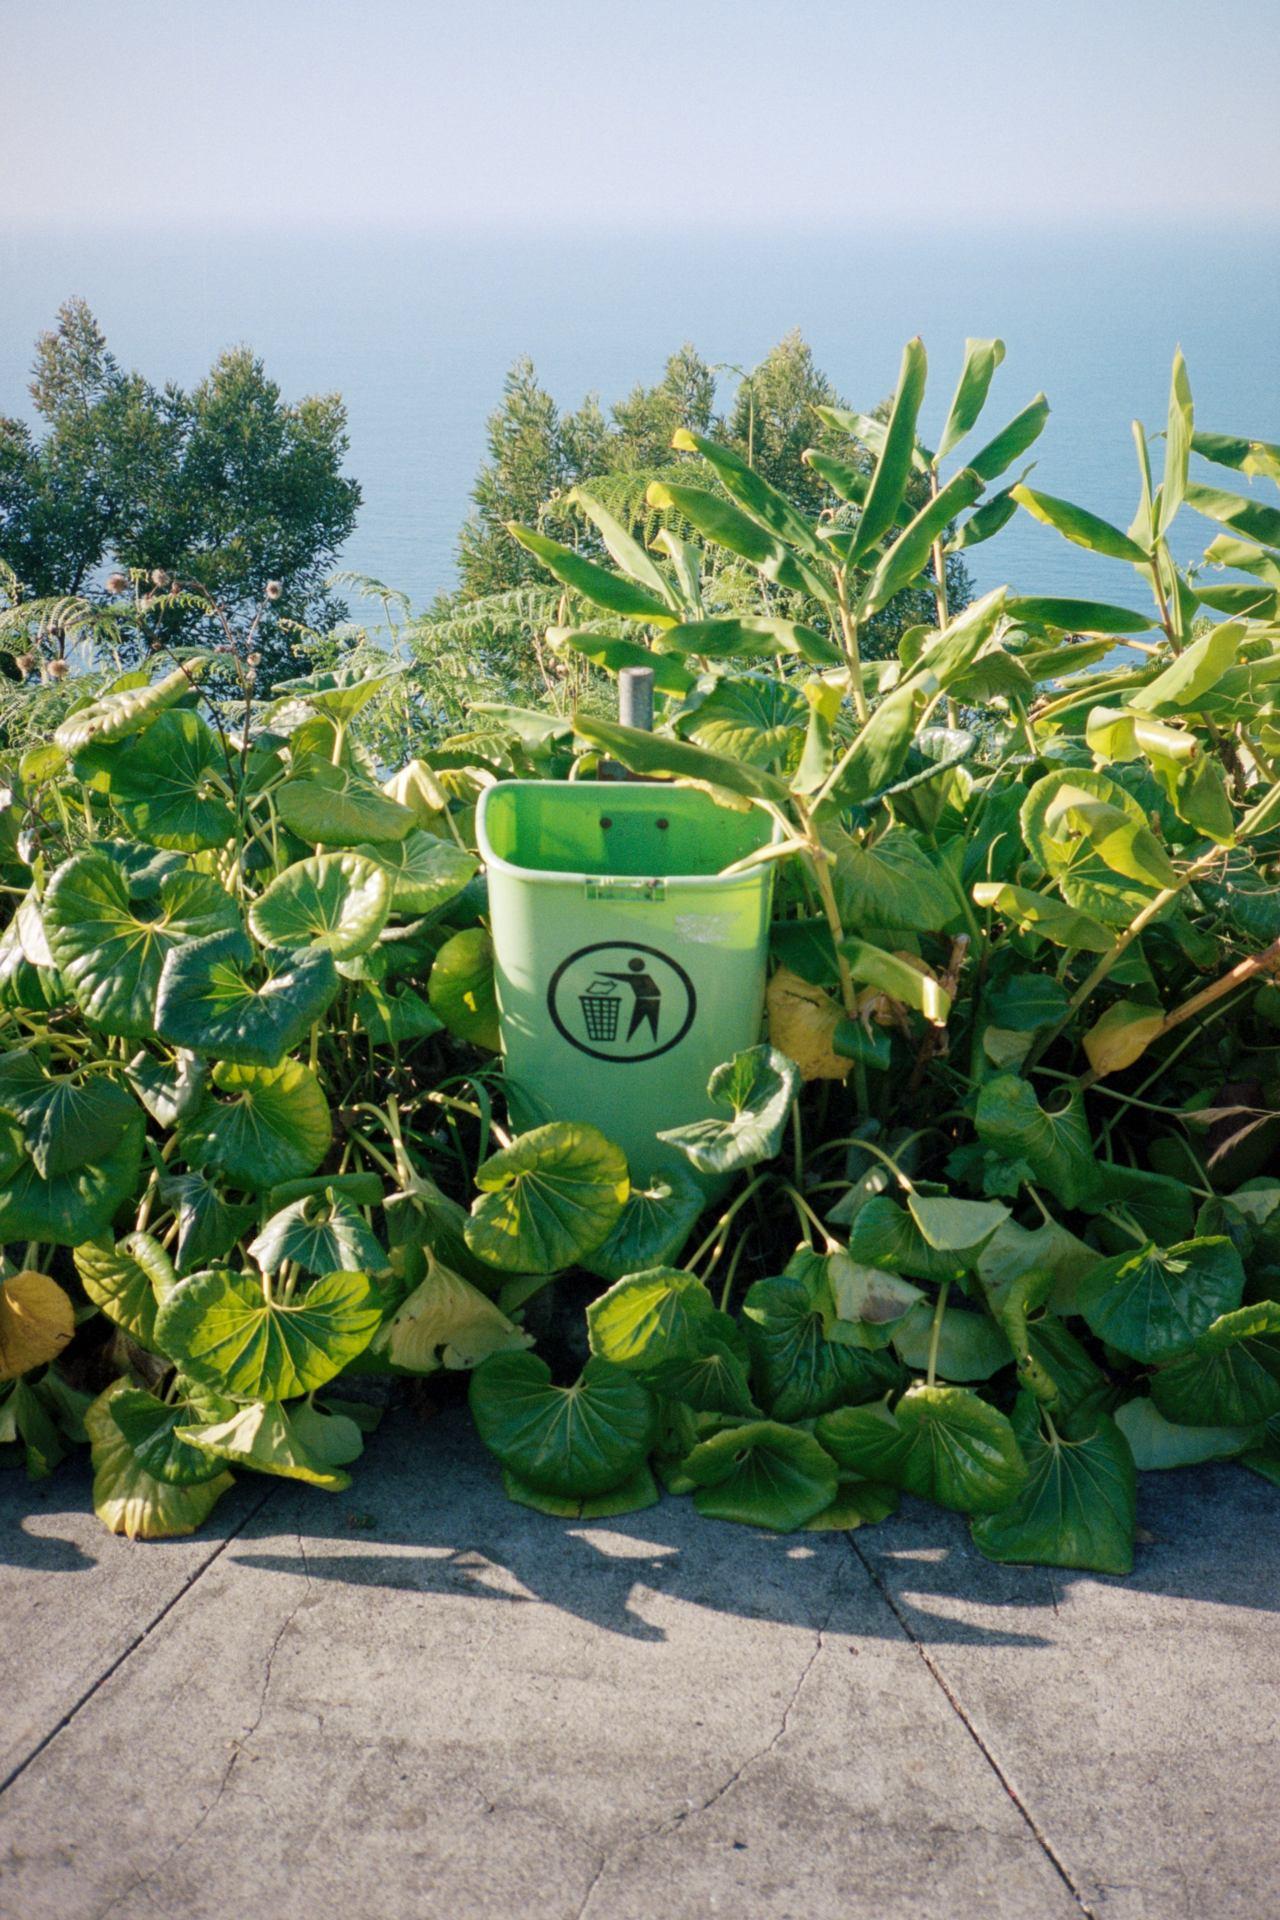 Madère green Trash, Yashica T5, Portra 400.